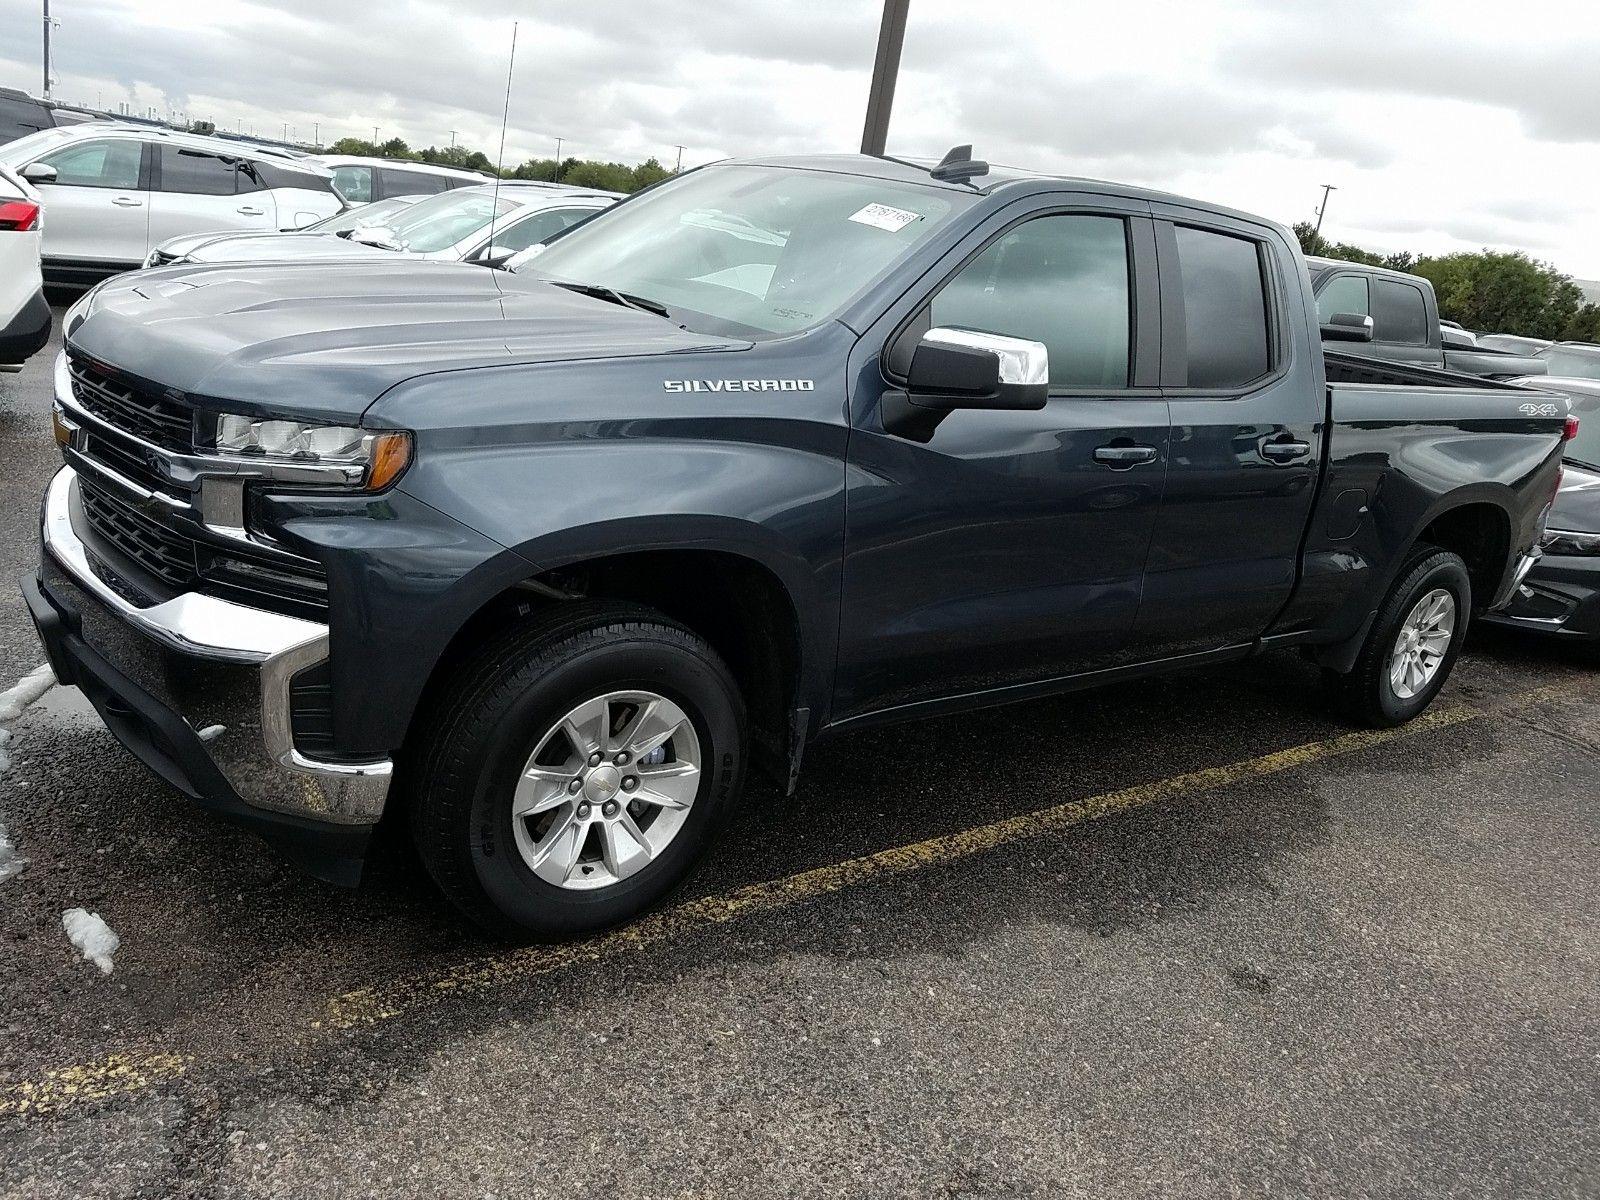 2020 Chevrolet Silverado 5.3. Lot 99913283055 Vin 1GCRYDED4LZ239117